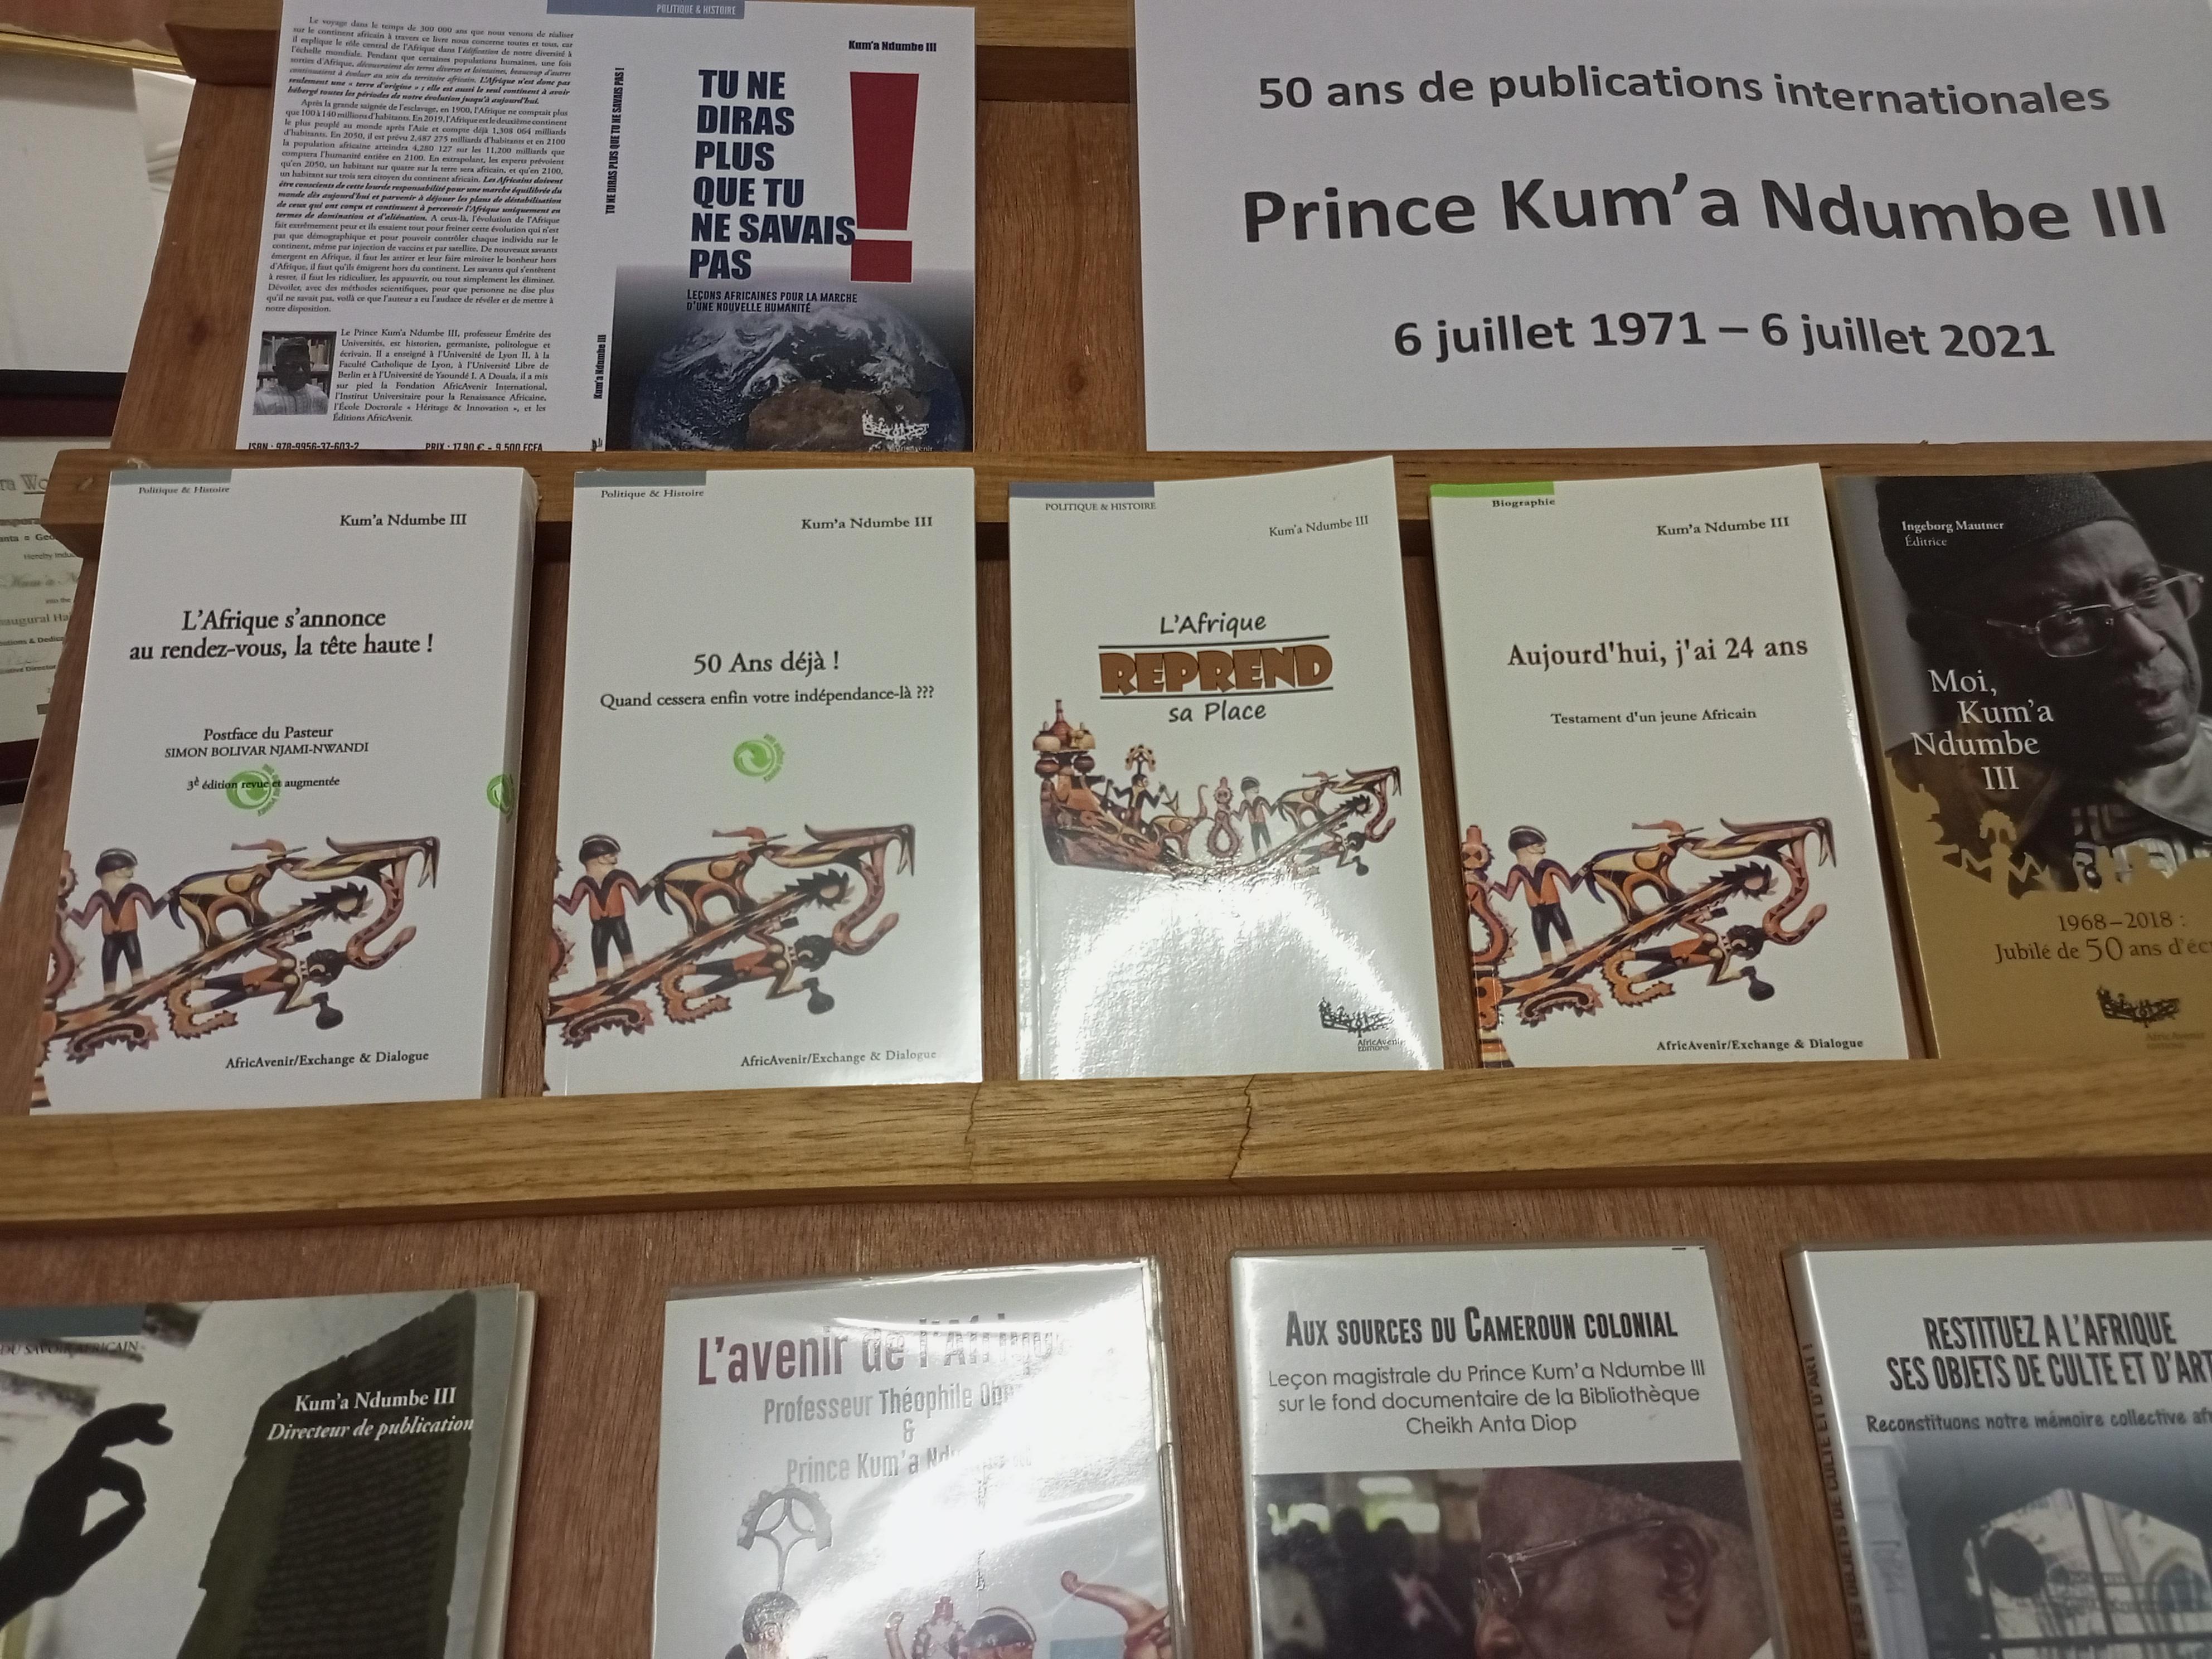 Kum'a Ndumbe III (6 juillet 1971 - 6 juillet 2021): 50 ans de publications internationales